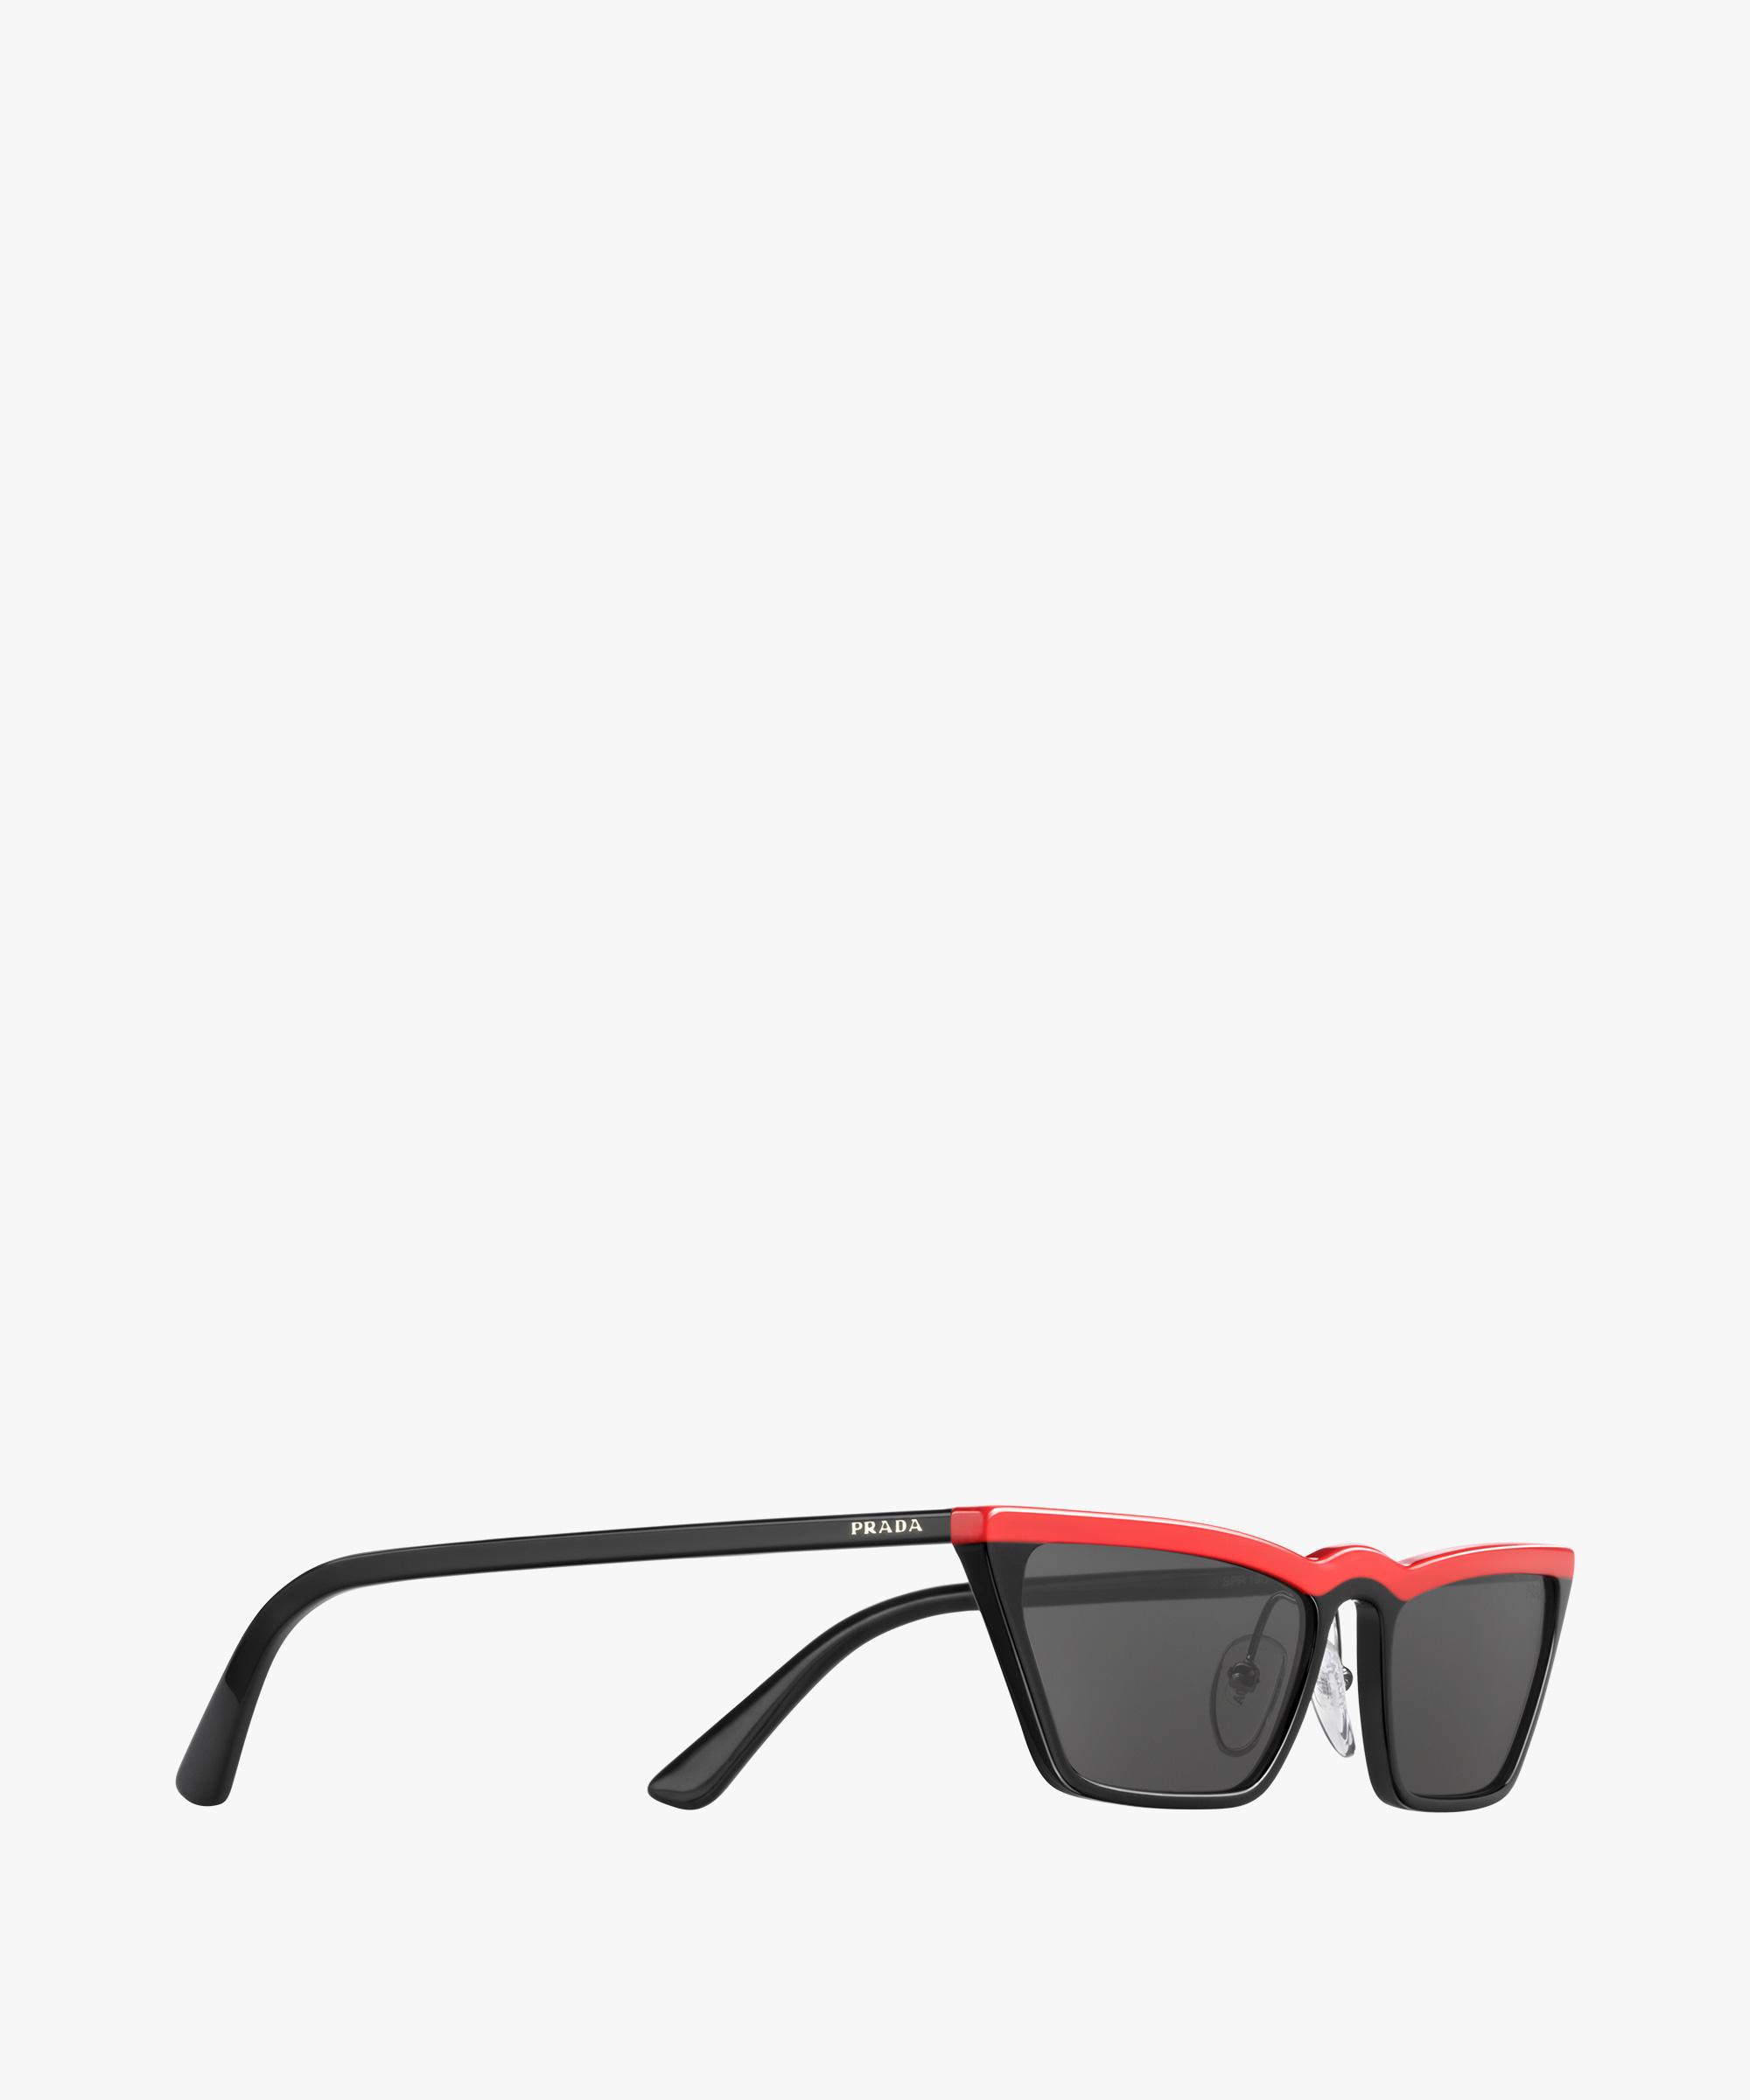 c5c760944cbb ... Prada Ultravox Eyewear Prada SLATE GRAY LENSES ...